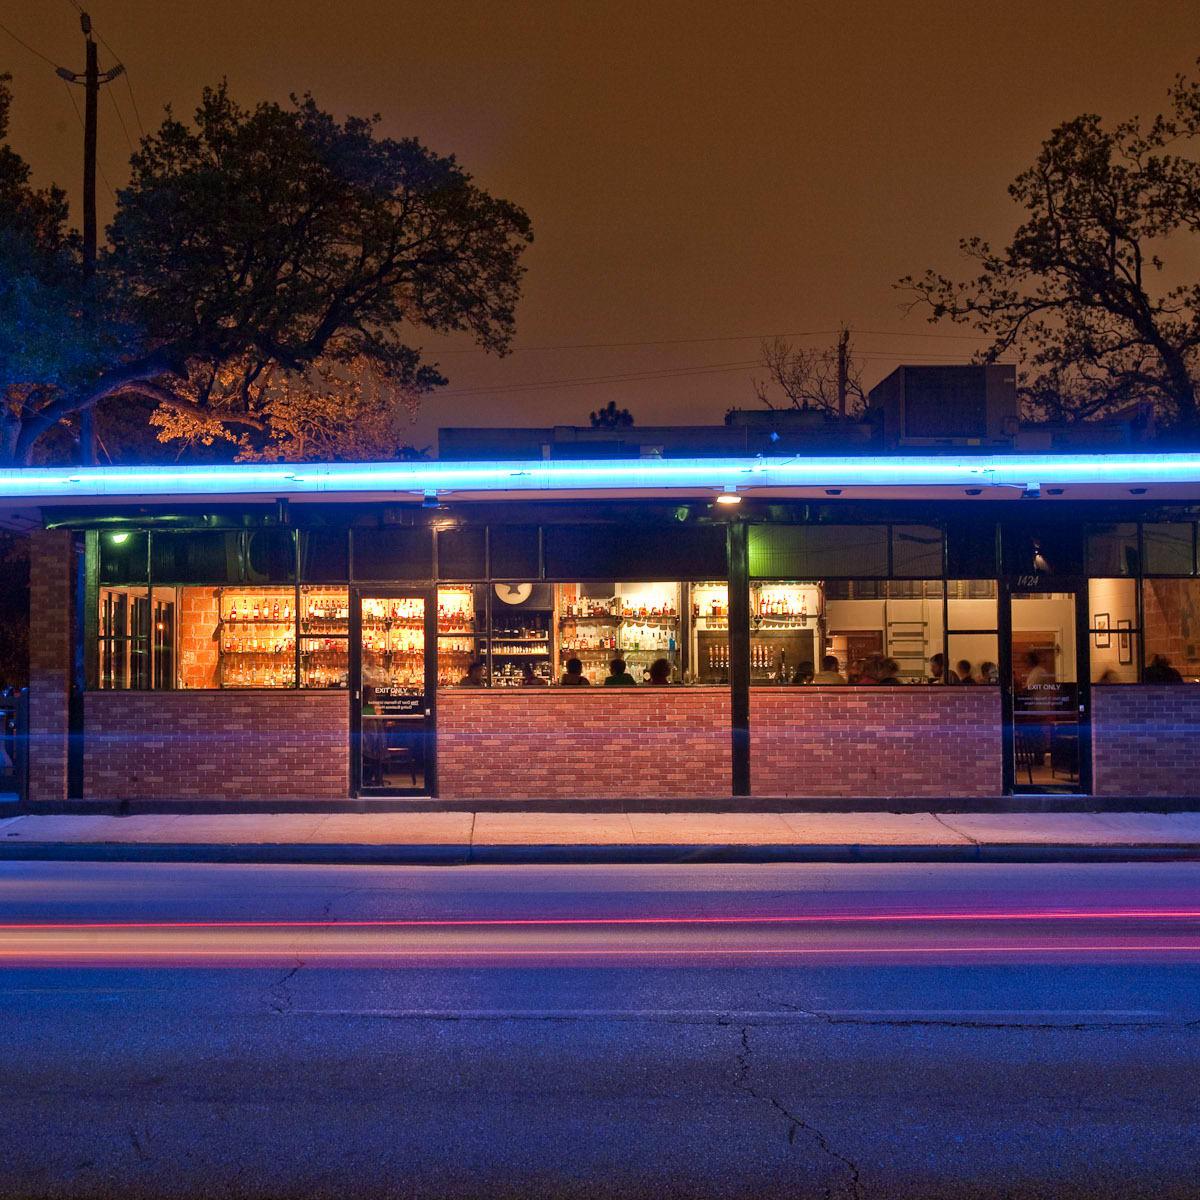 Houston Restaurant Weeks And 100 Great Bars Lead Week's